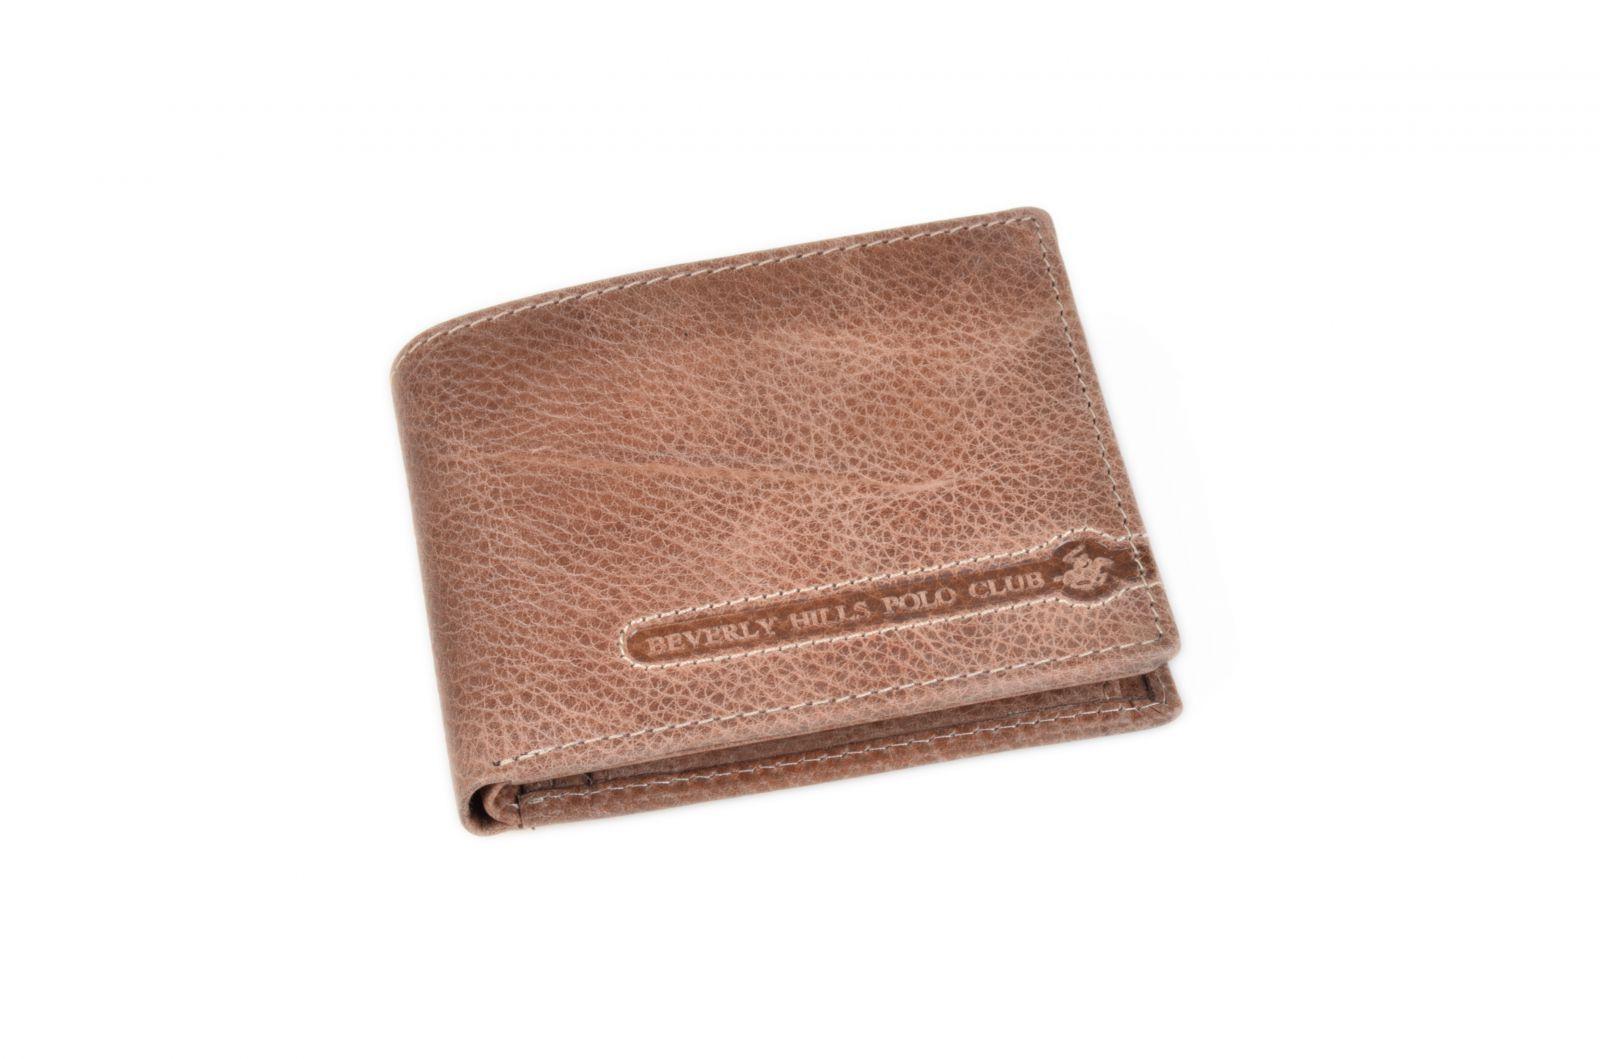 Peněženka pánská BHPC Tucson BH-393-25 hnědá v krabičce